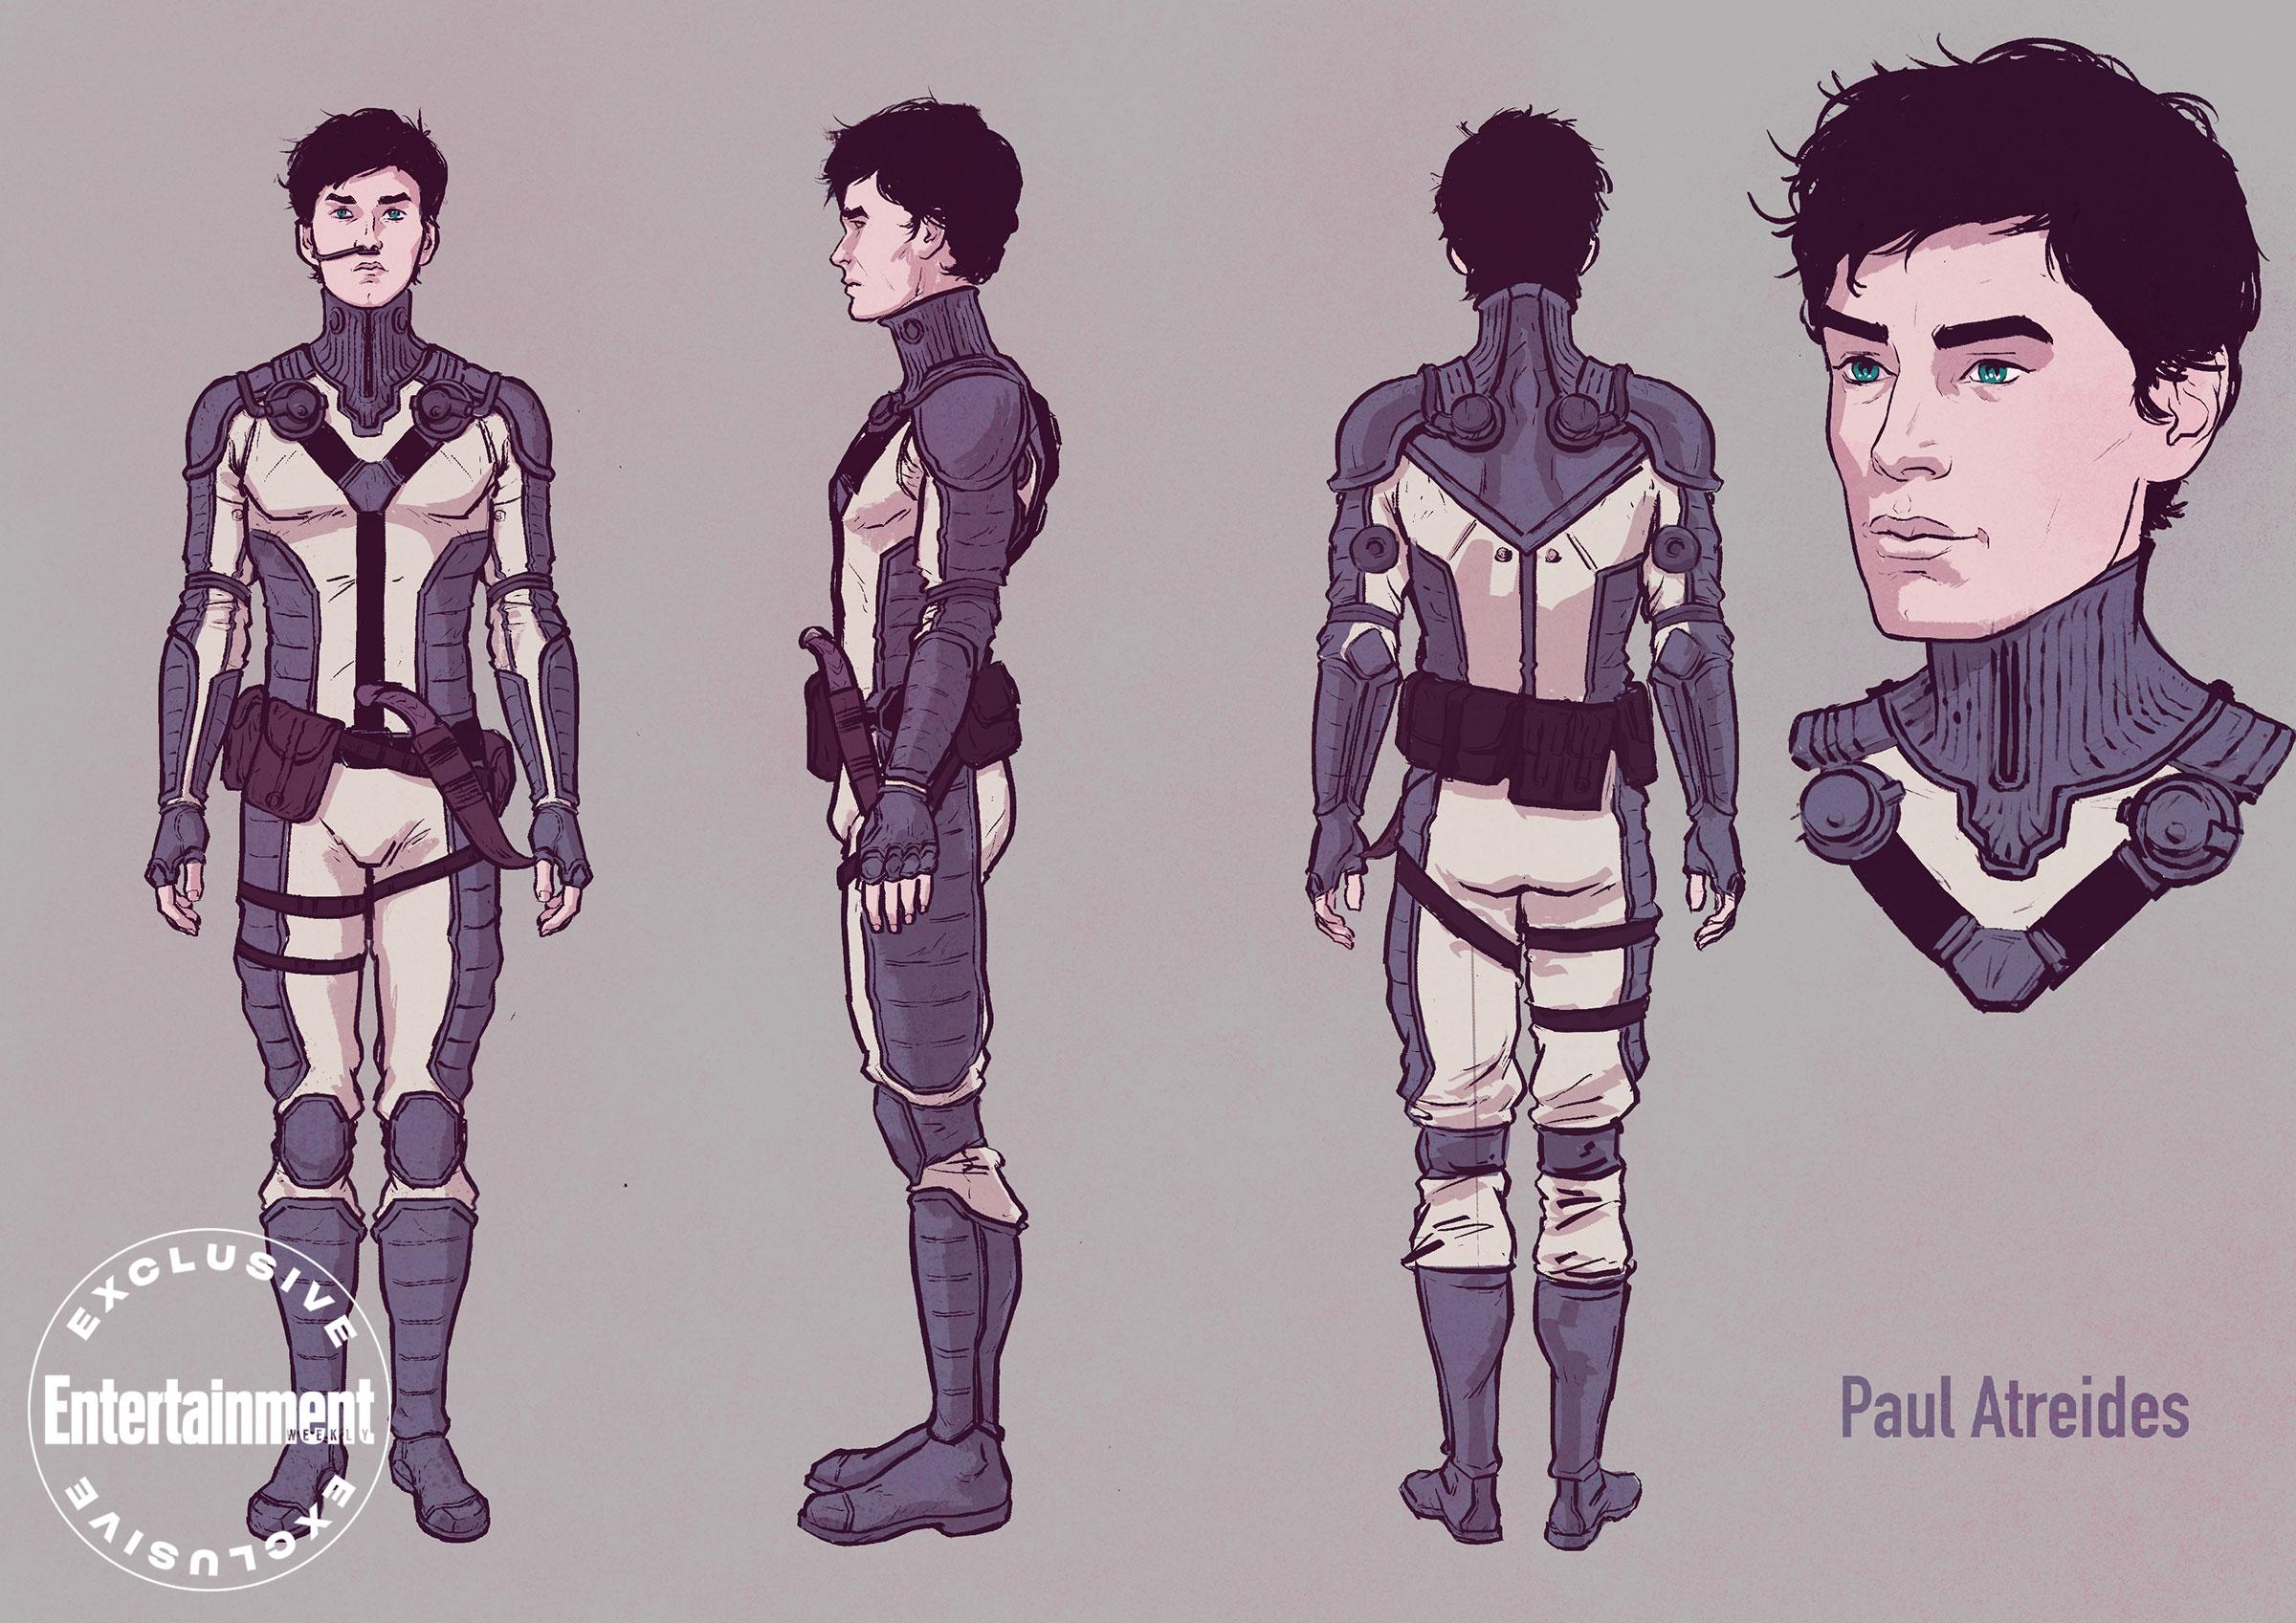 Dune graphic novel - Paul Atreides